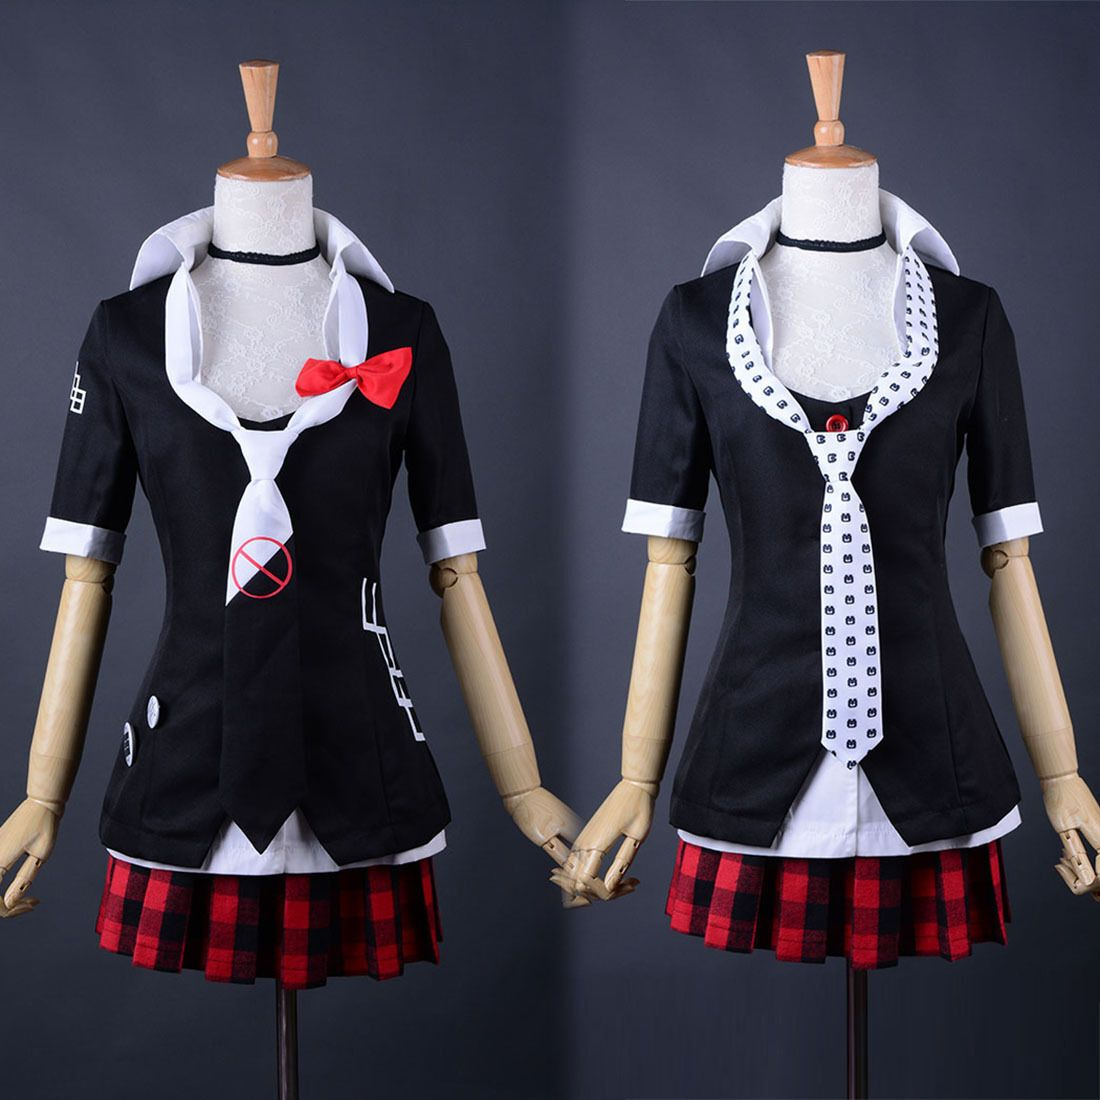 Hot Danganronpa Junko Enoshima Uniform Mini Dress Shirt Skirt Tie Anime Cosplay